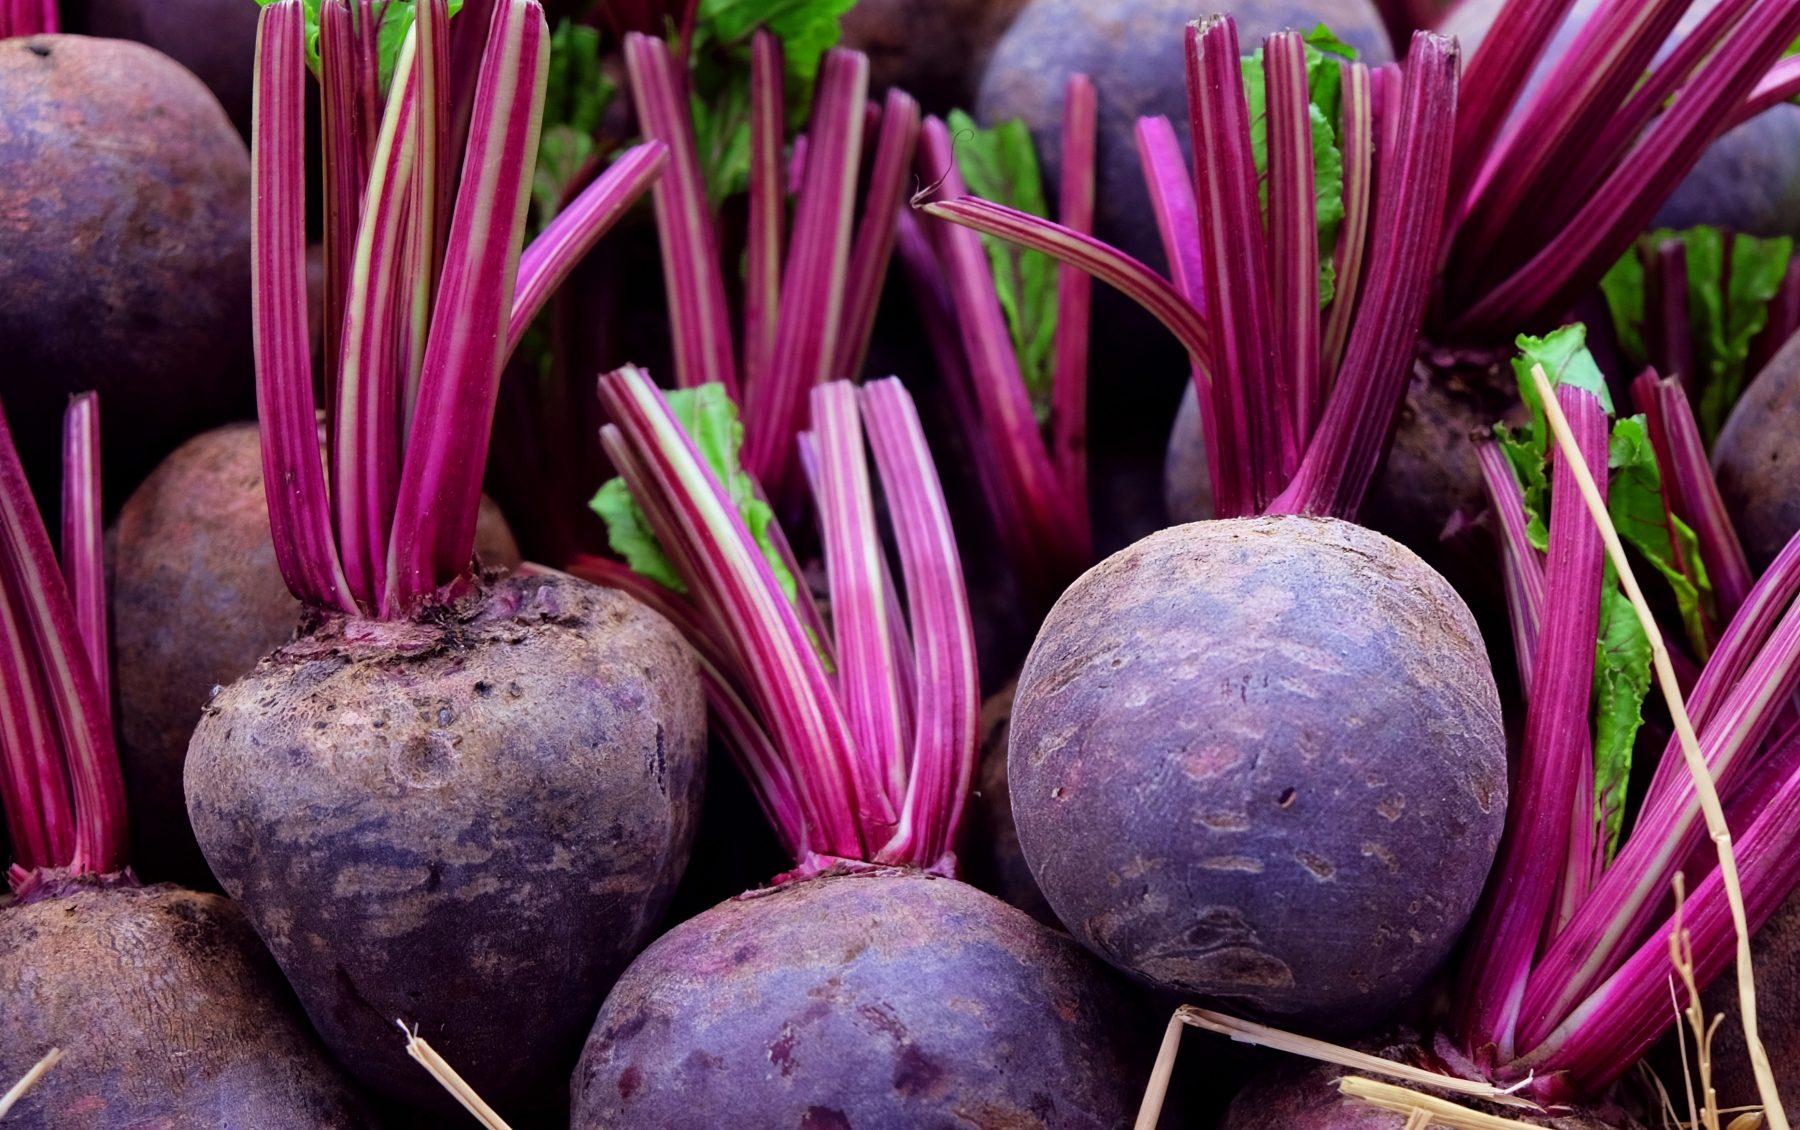 beets by darasp kran ss crop